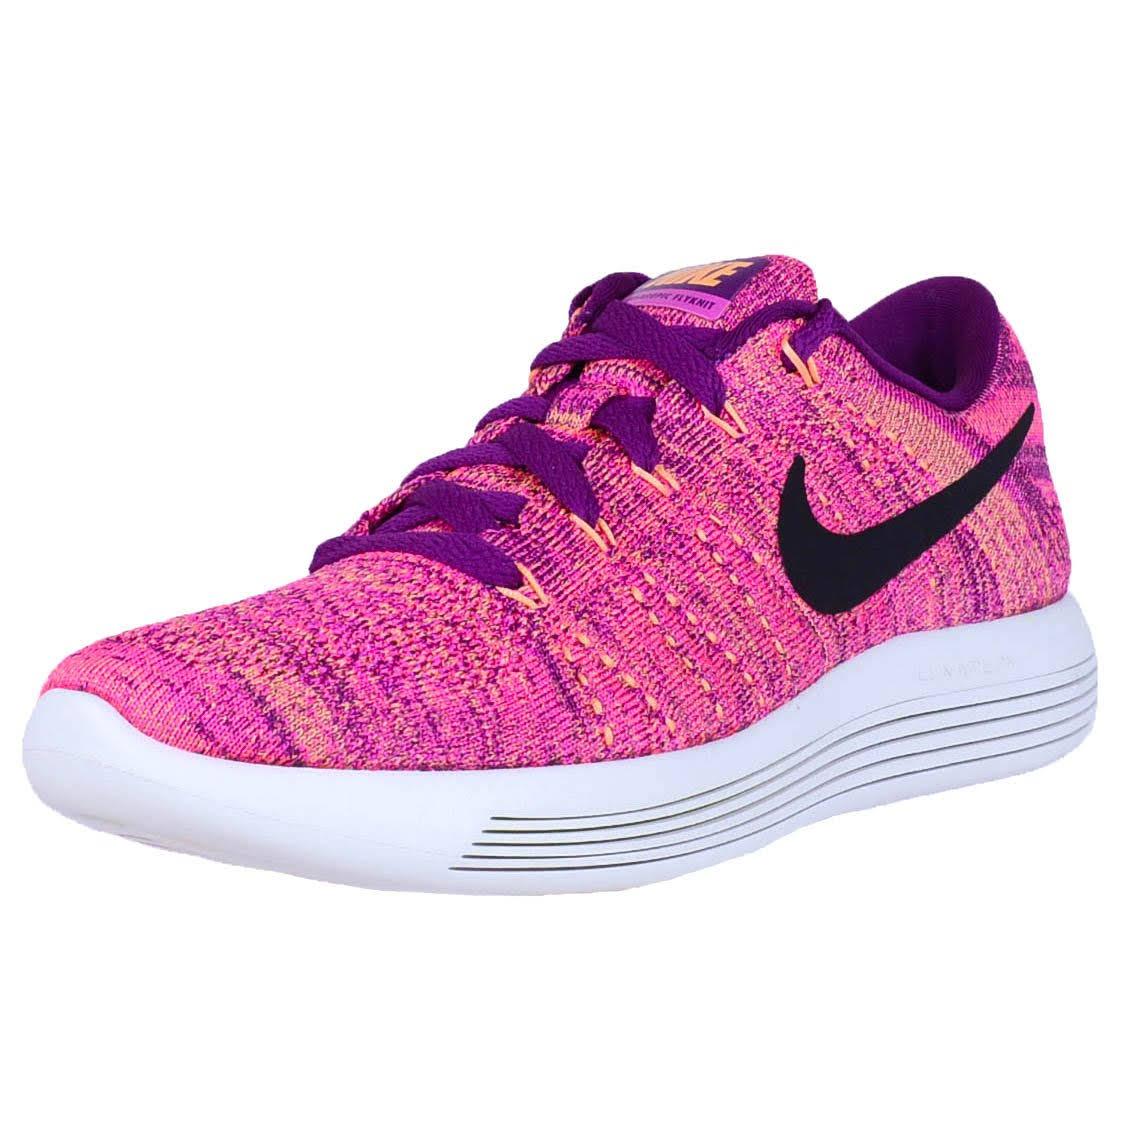 Lunarepic 843765 Schwarz Flyknit Low feuer Bright Nike 500 Grape Pink aZqdxpaw